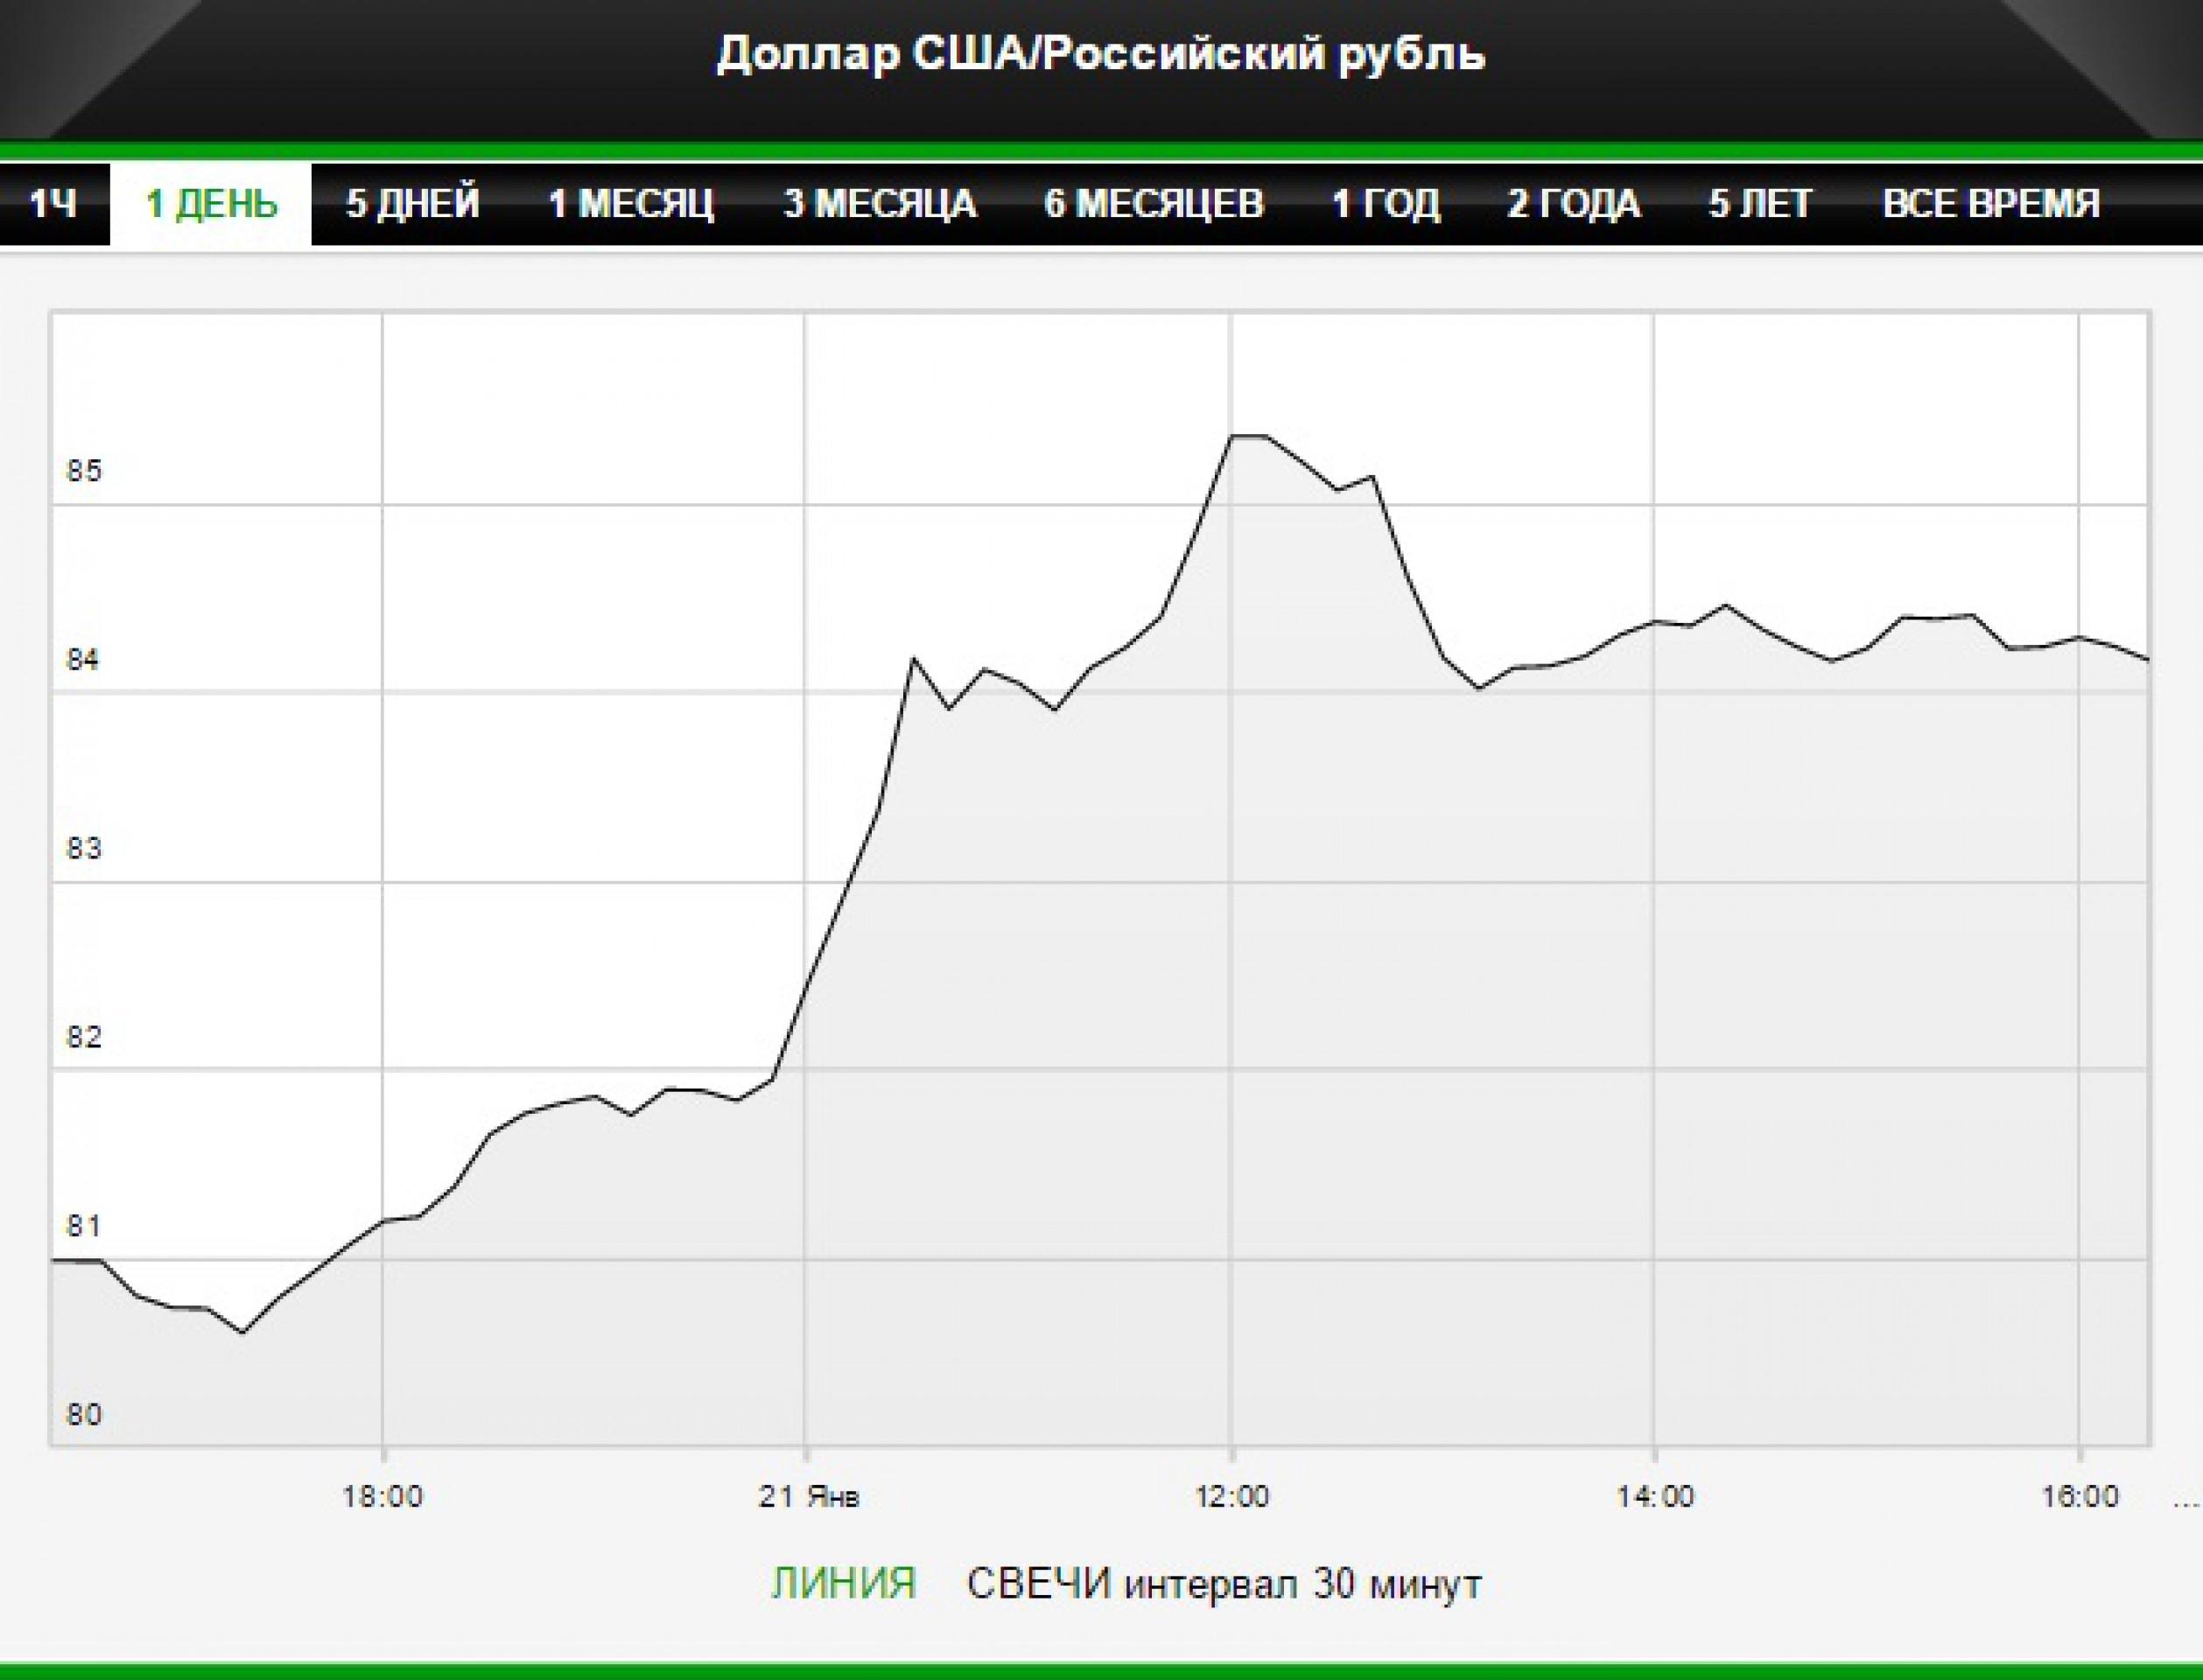 Официальный курс ЦБ рекордно упал - сразу на 4 рубля